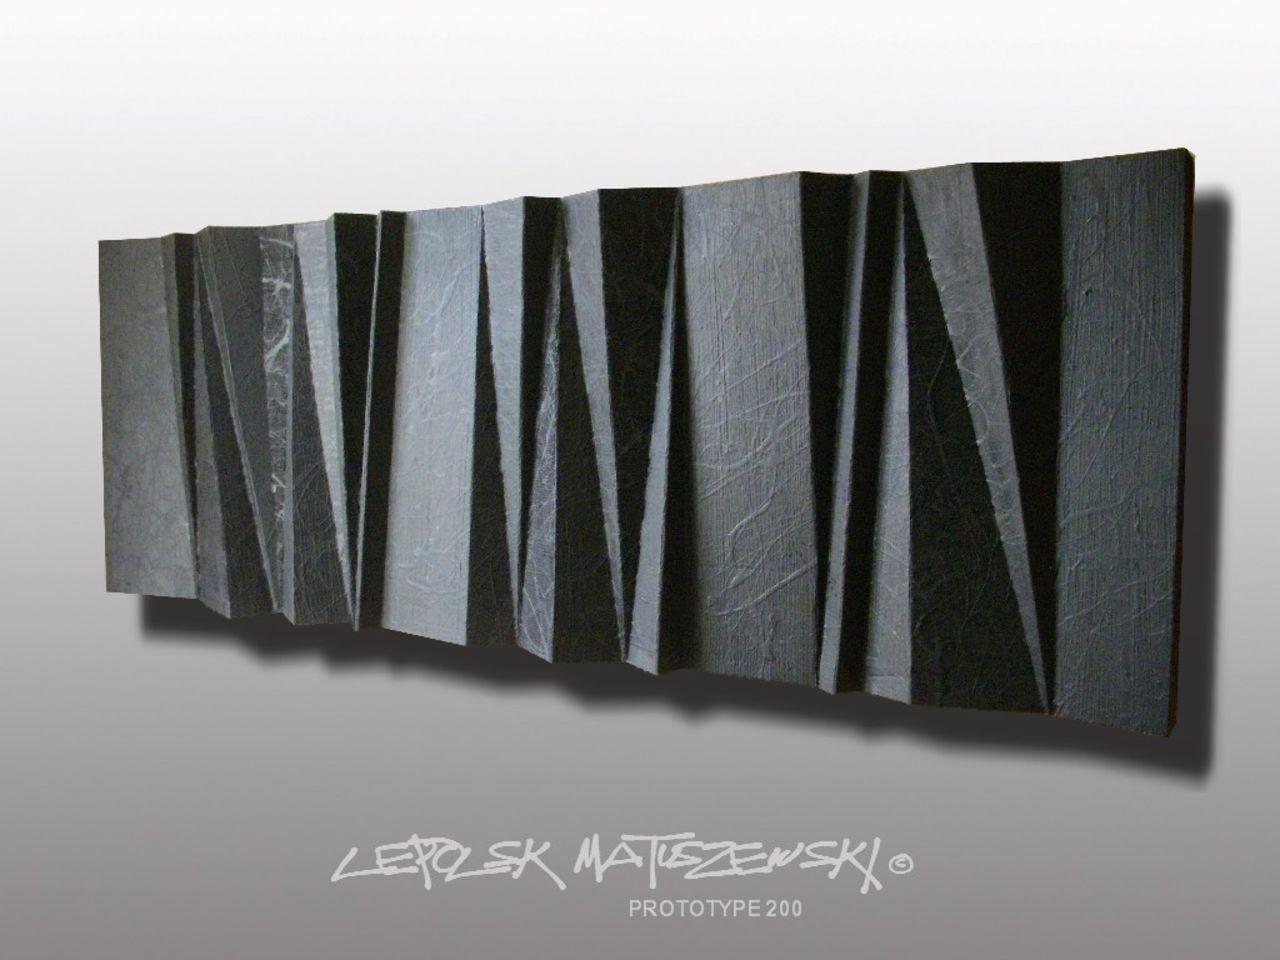 LEPOLSK MATUSZEWSKI PROTOTYPE 200  expressionnisme abstrait